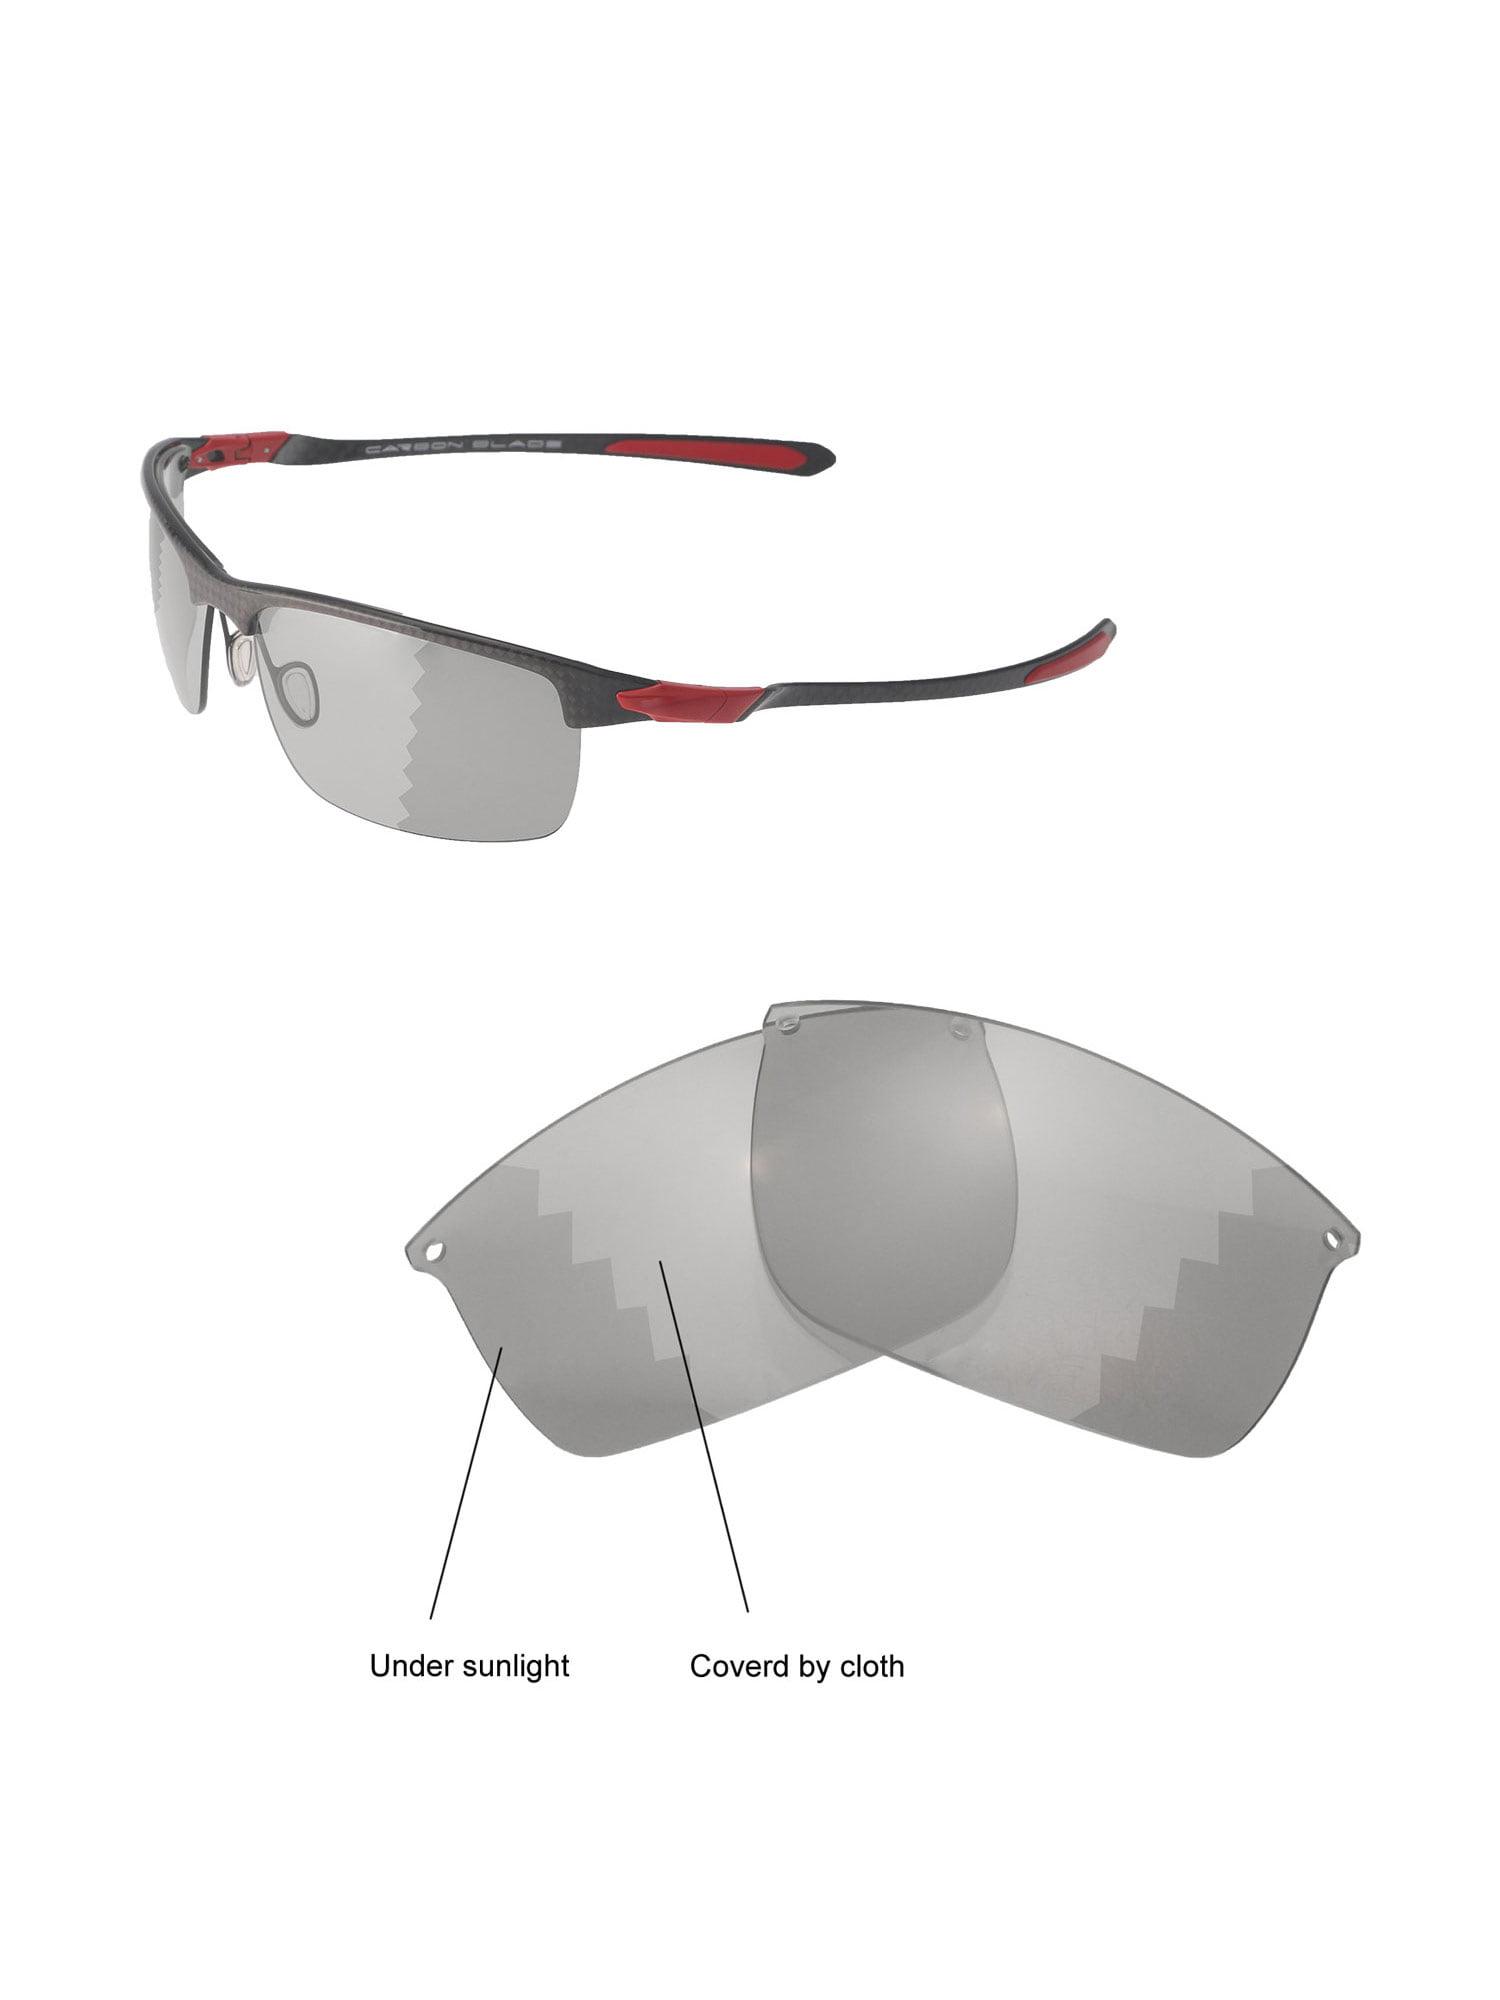 30f29e7955bce Walleva Black Polarized Replacement Lenses for Oakley Carbon Blade  Sunglasses - Walmart.com